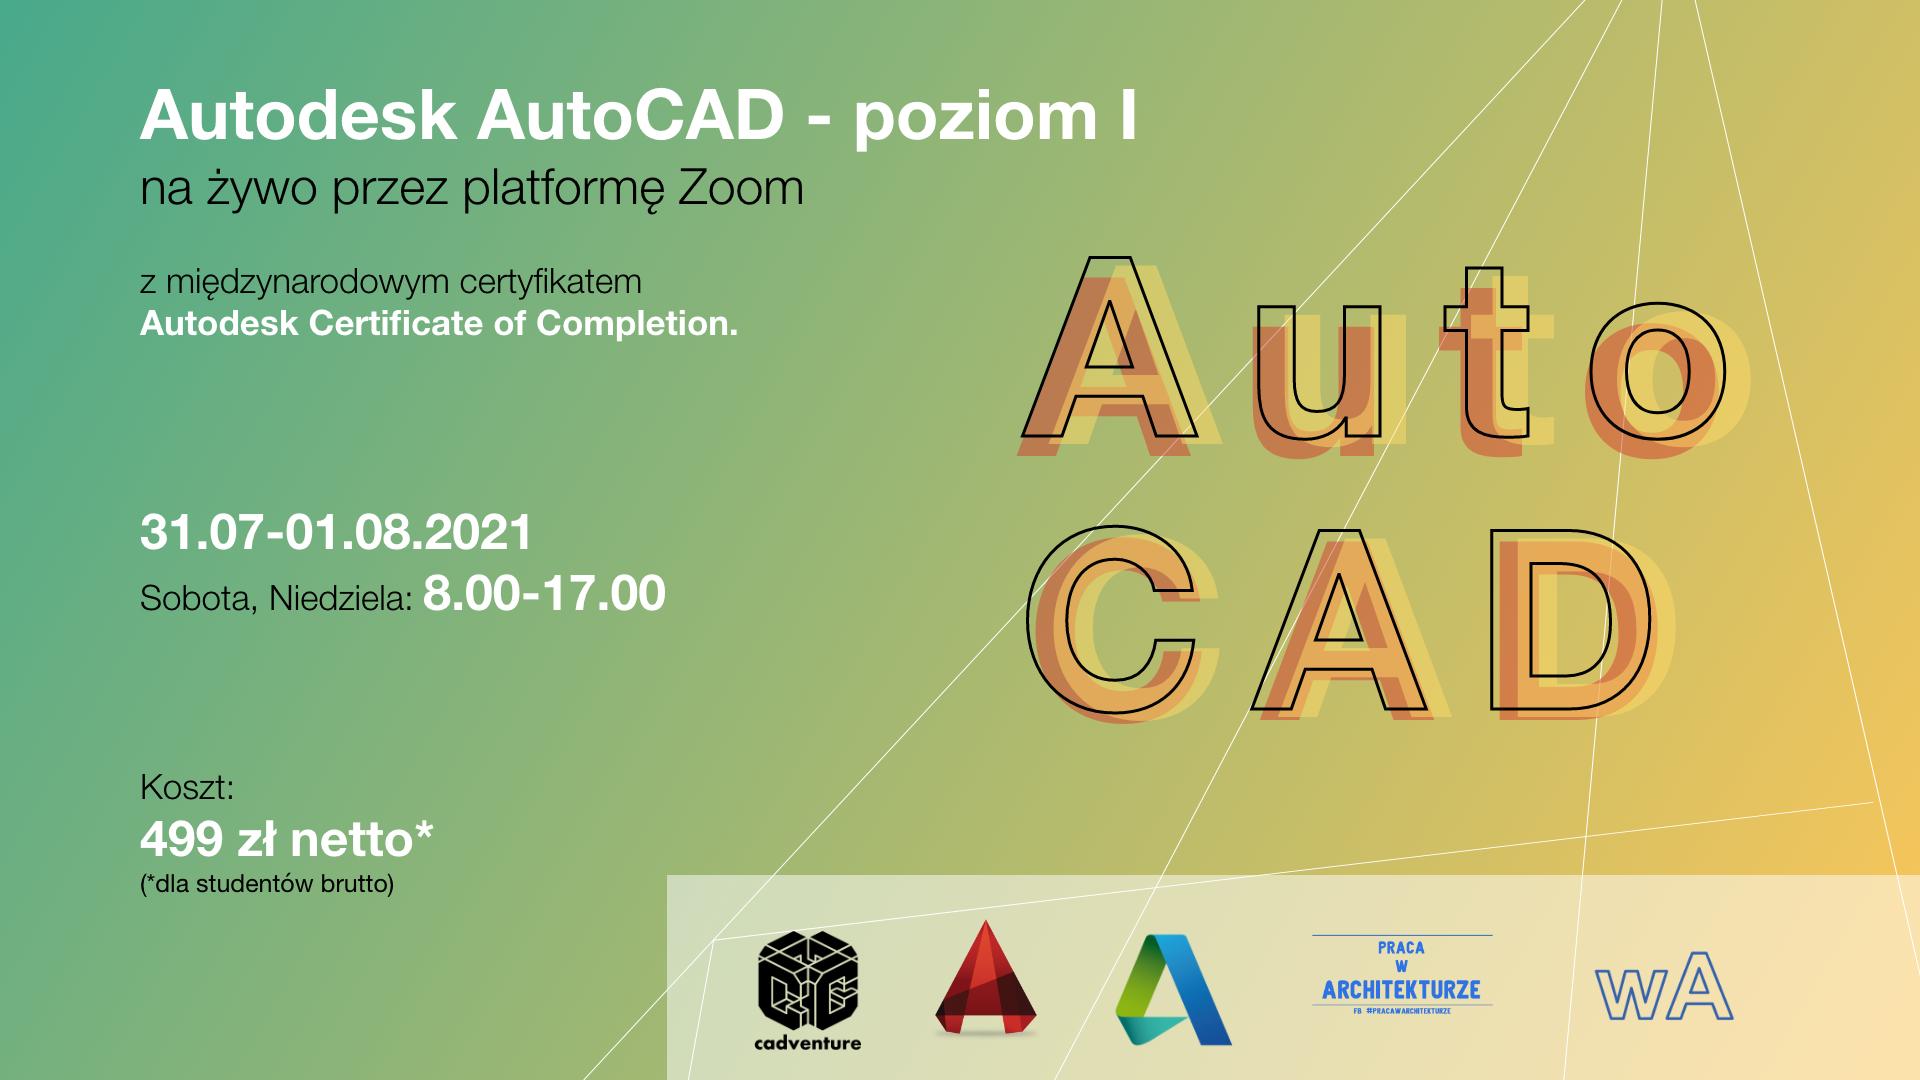 AutoCAD 31.07-01.08